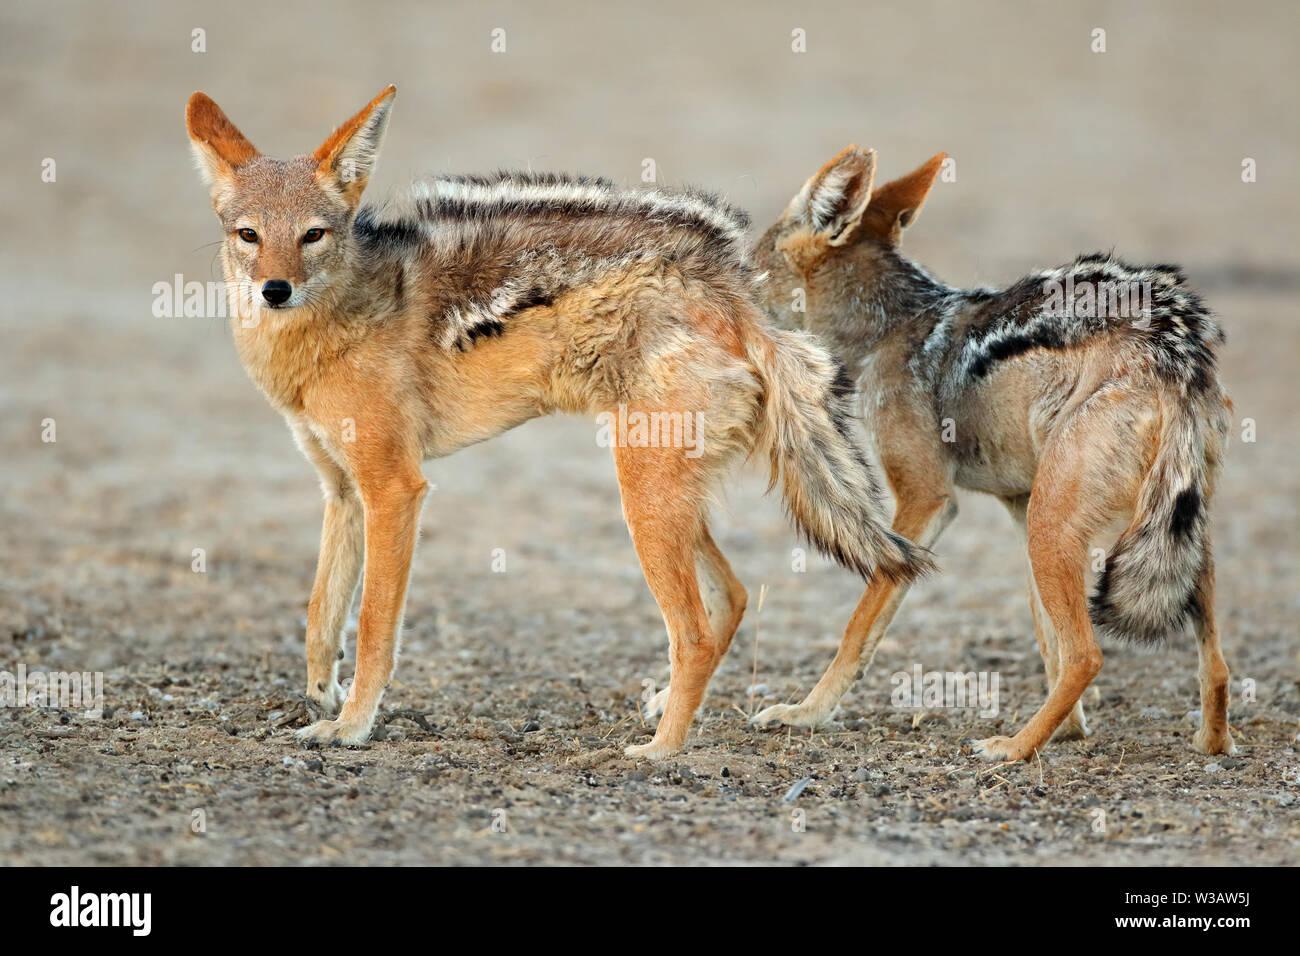 A pair of black-backed jackals (Canis mesomelas), Kalahari desert, South Africa Stock Photo